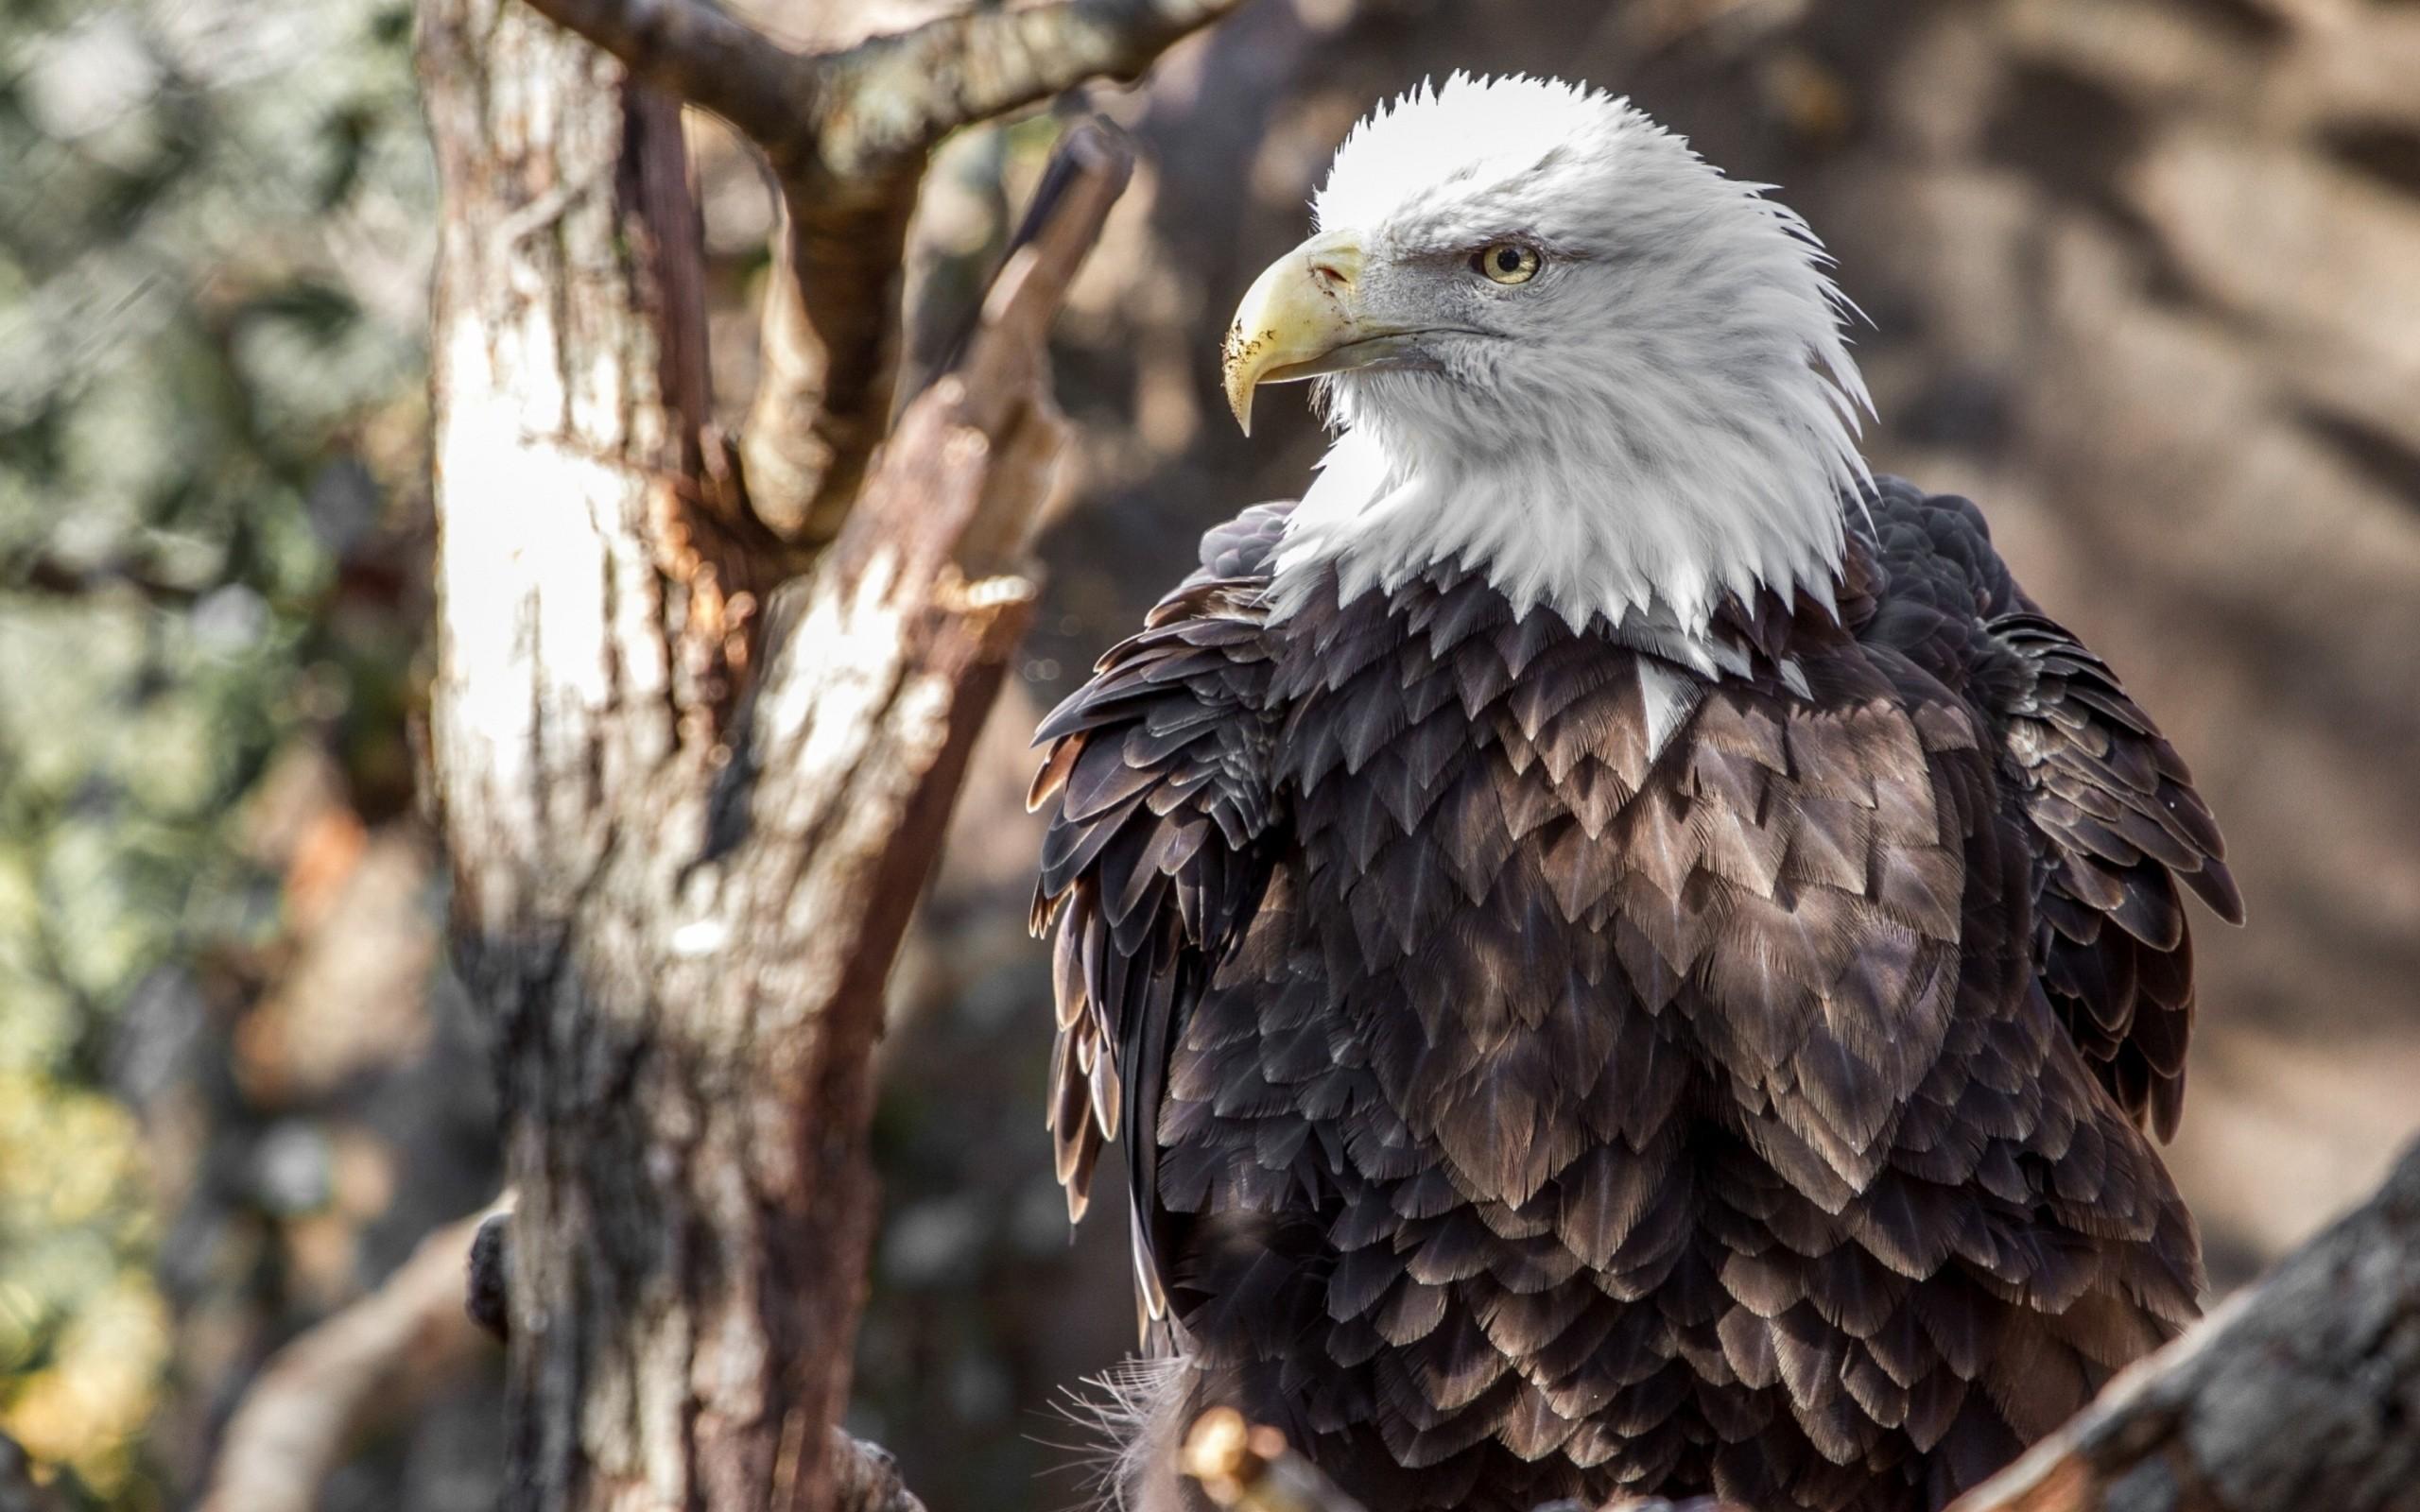 birds blurred eagle bald eagle nature animals